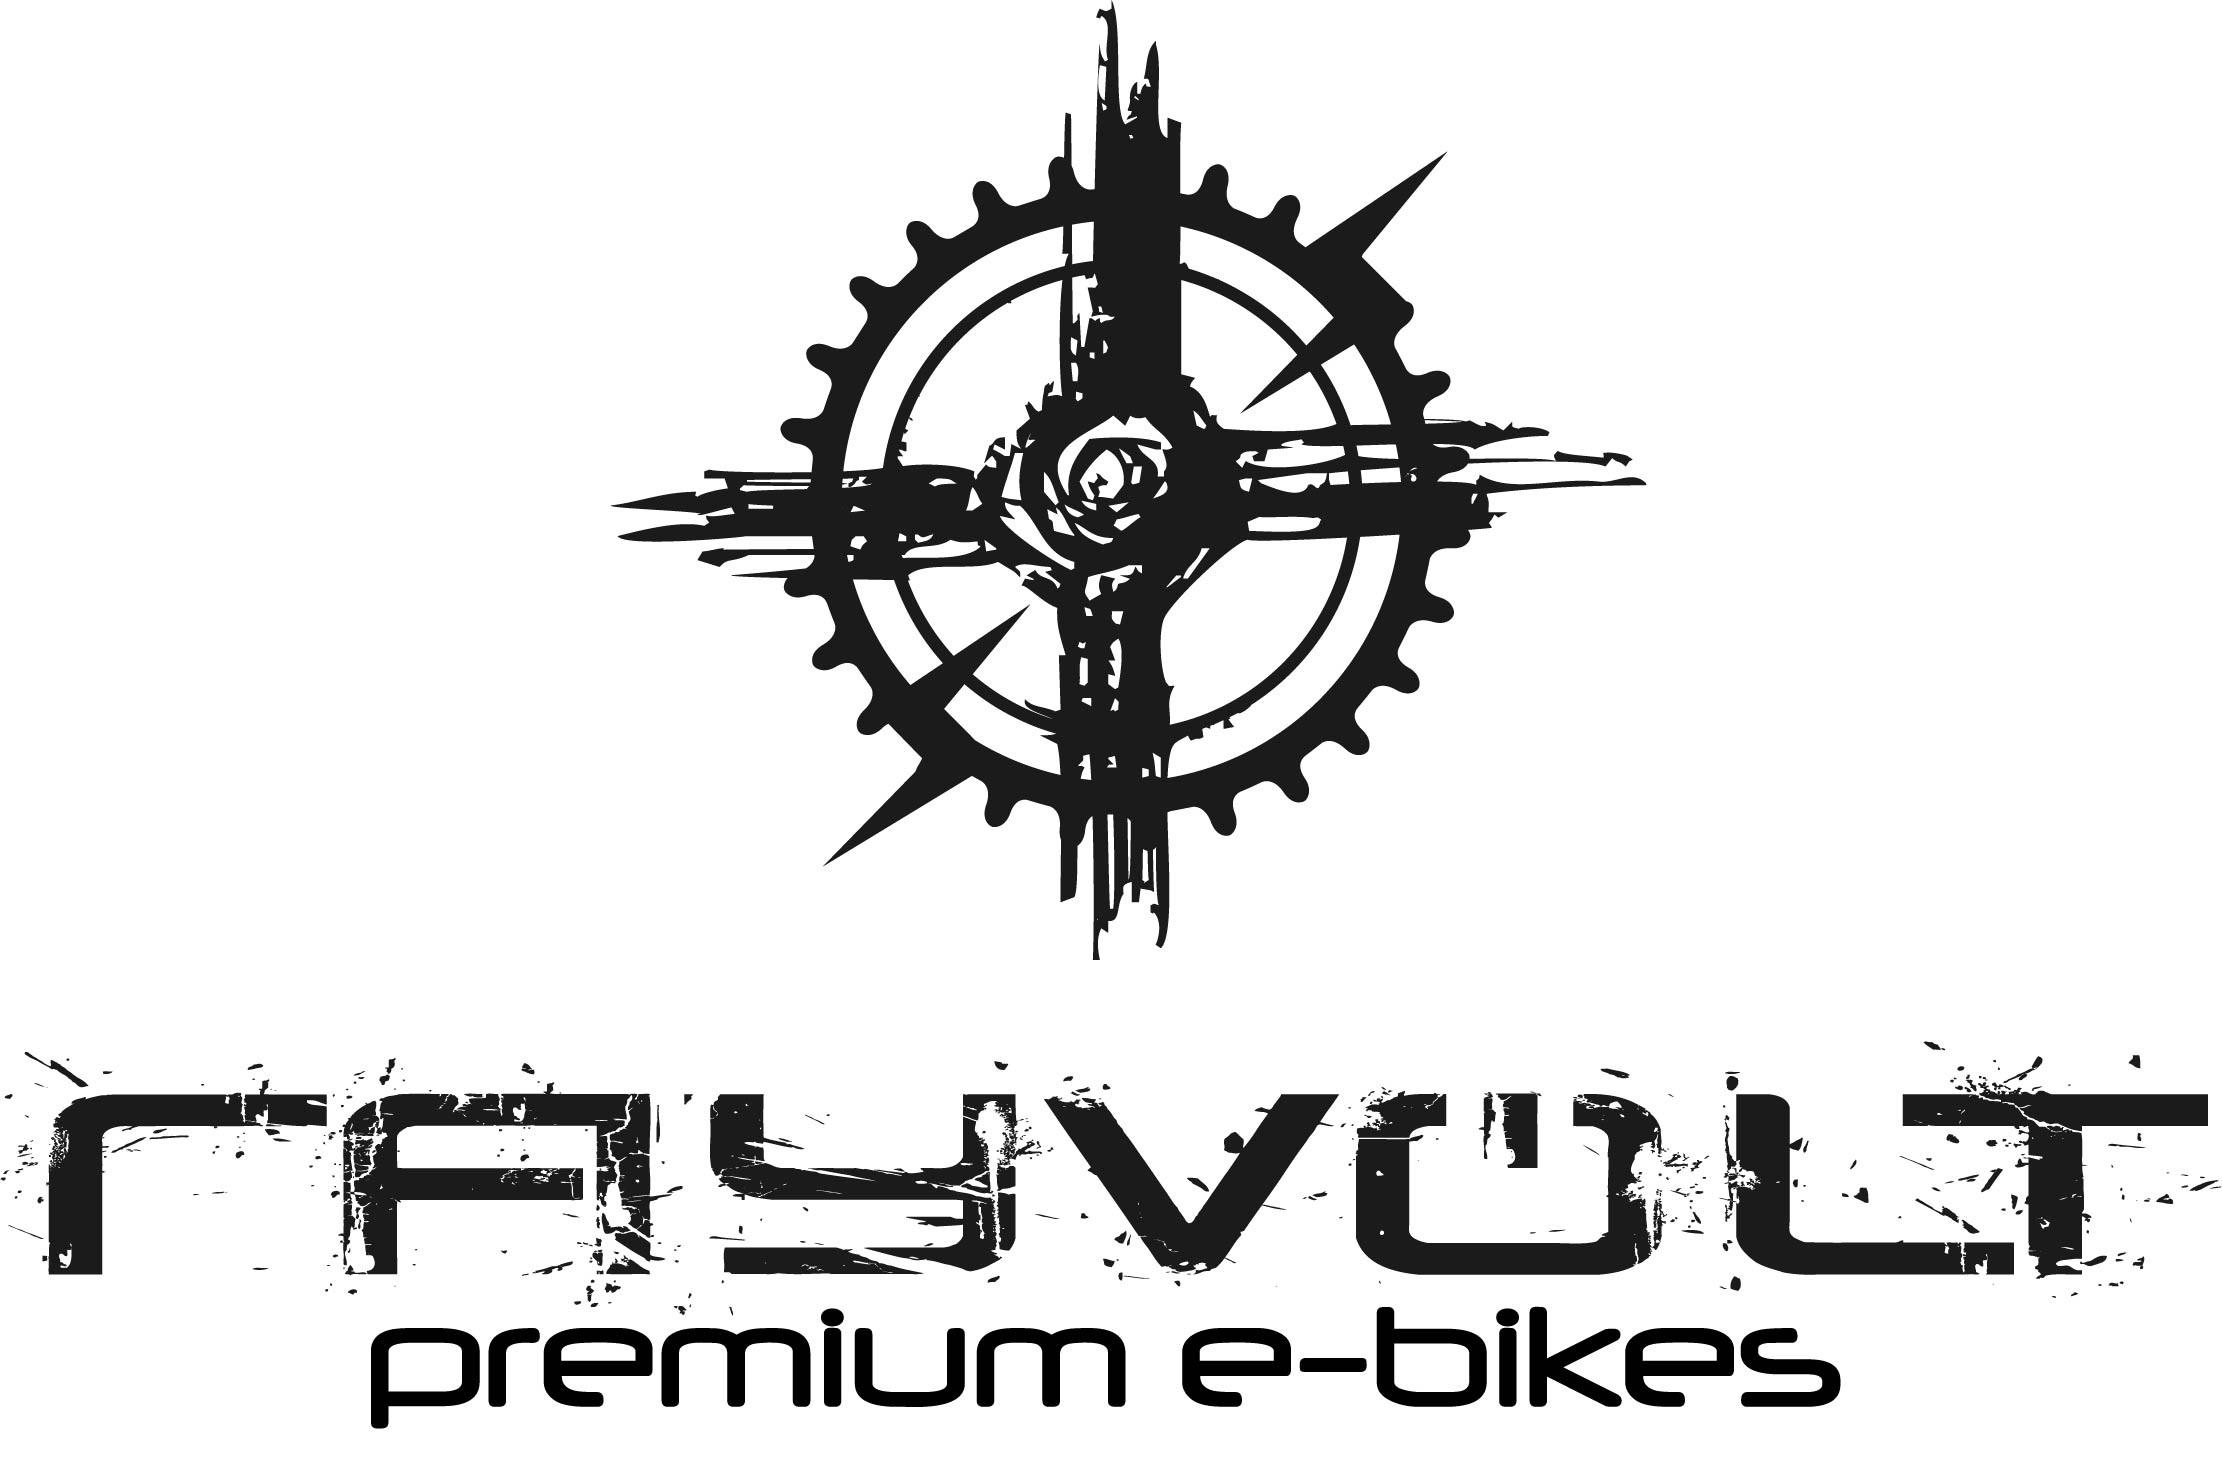 rayvolt_logo_ebikes.jpg